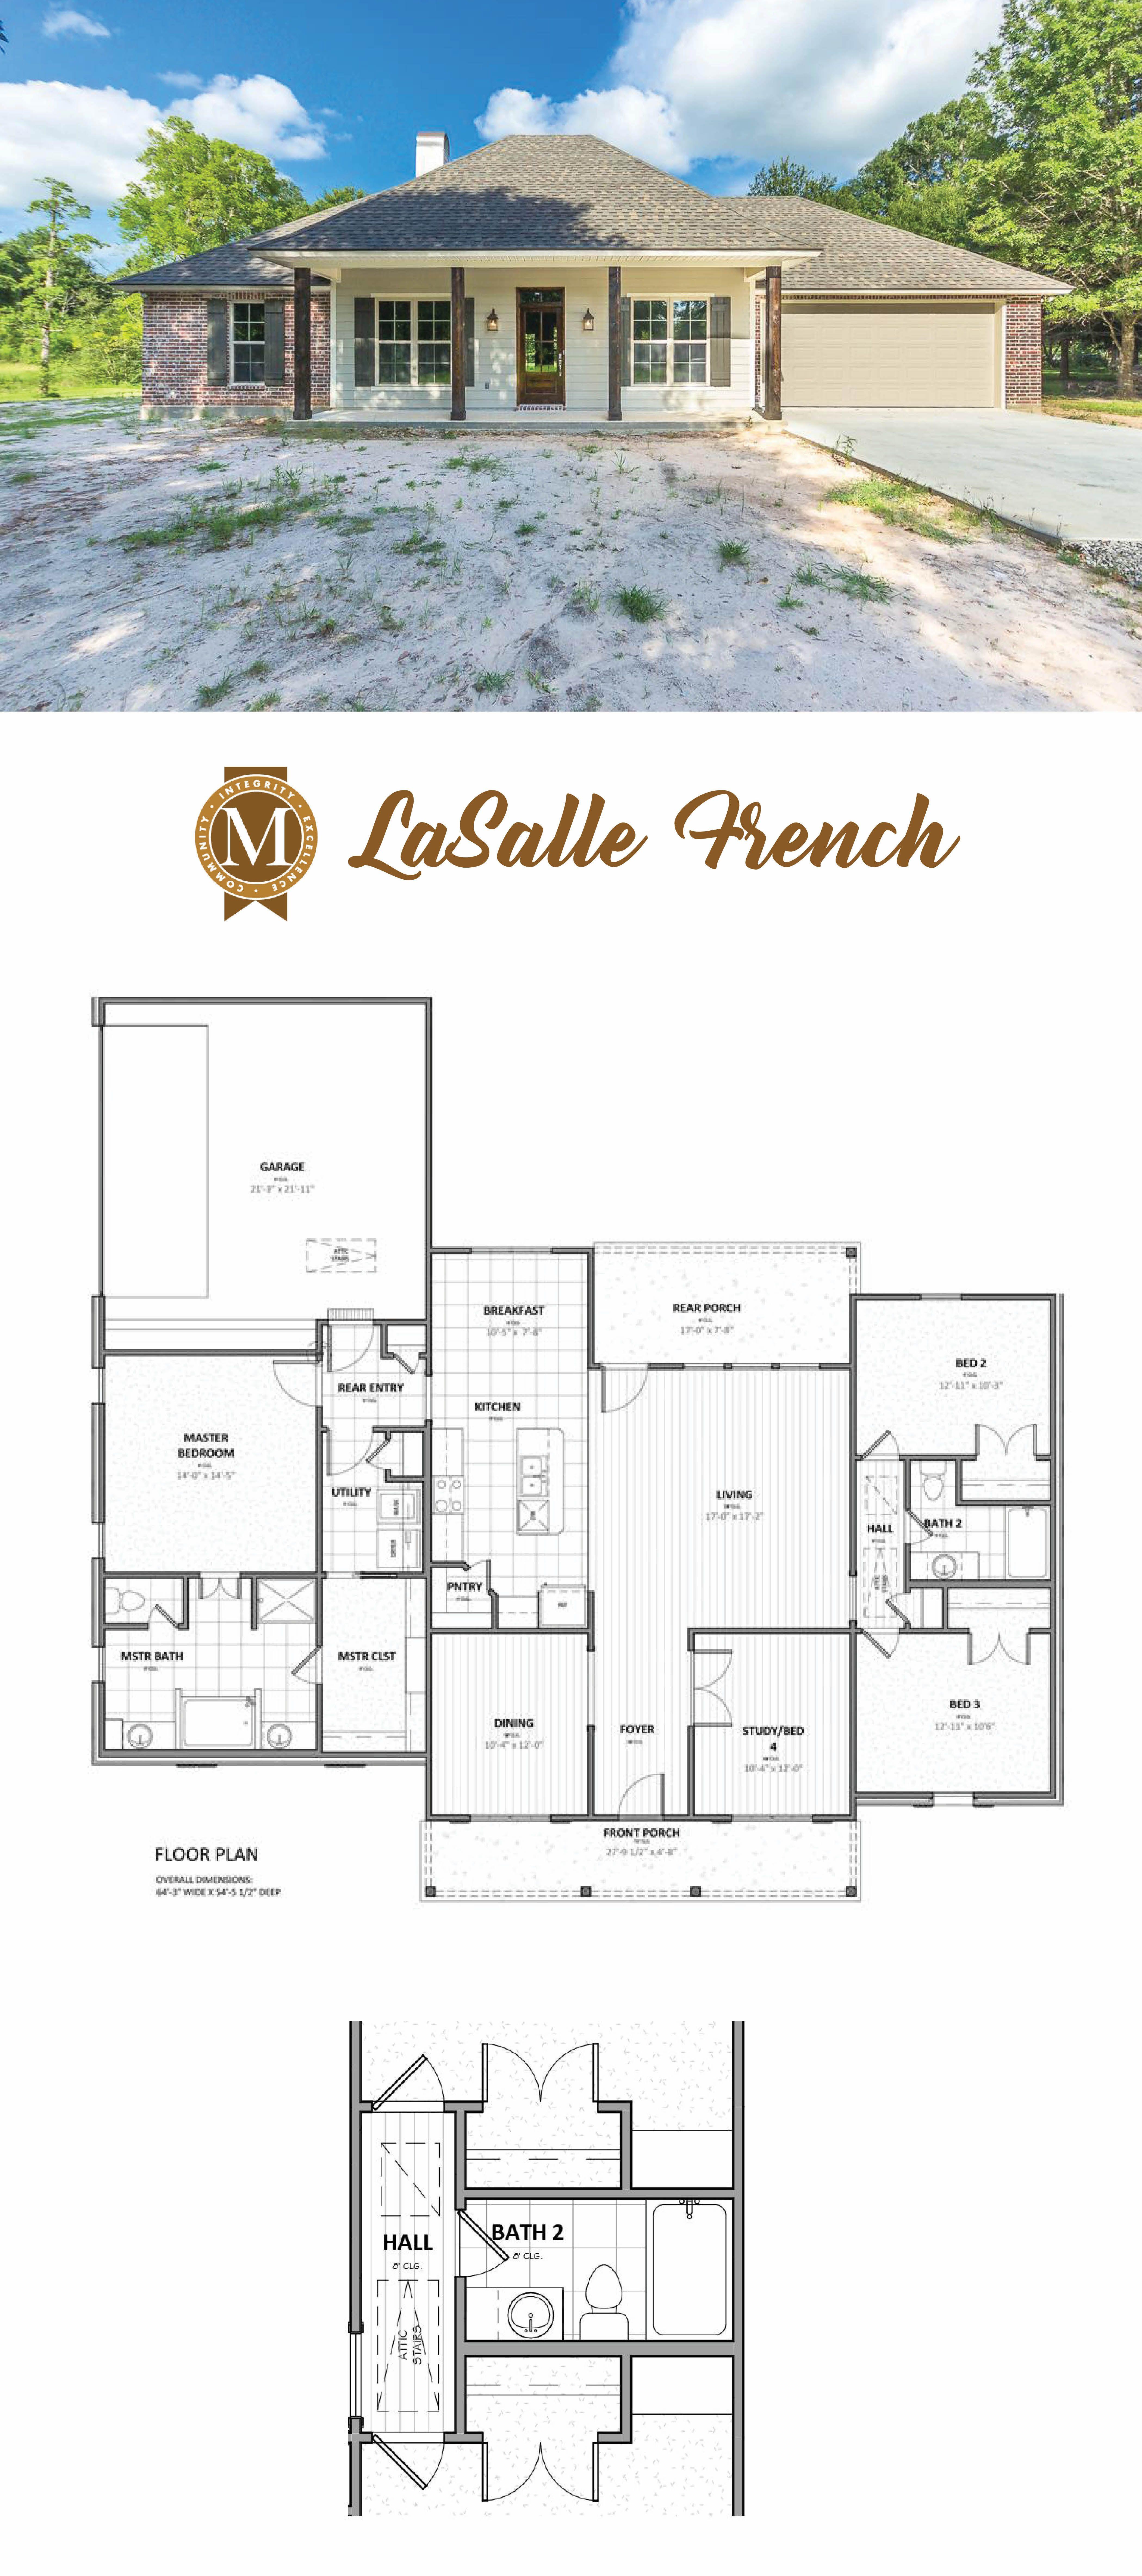 Lasalle French Floor Plan Living Sq Ft 2 031 Bedrooms 3 Baths 2